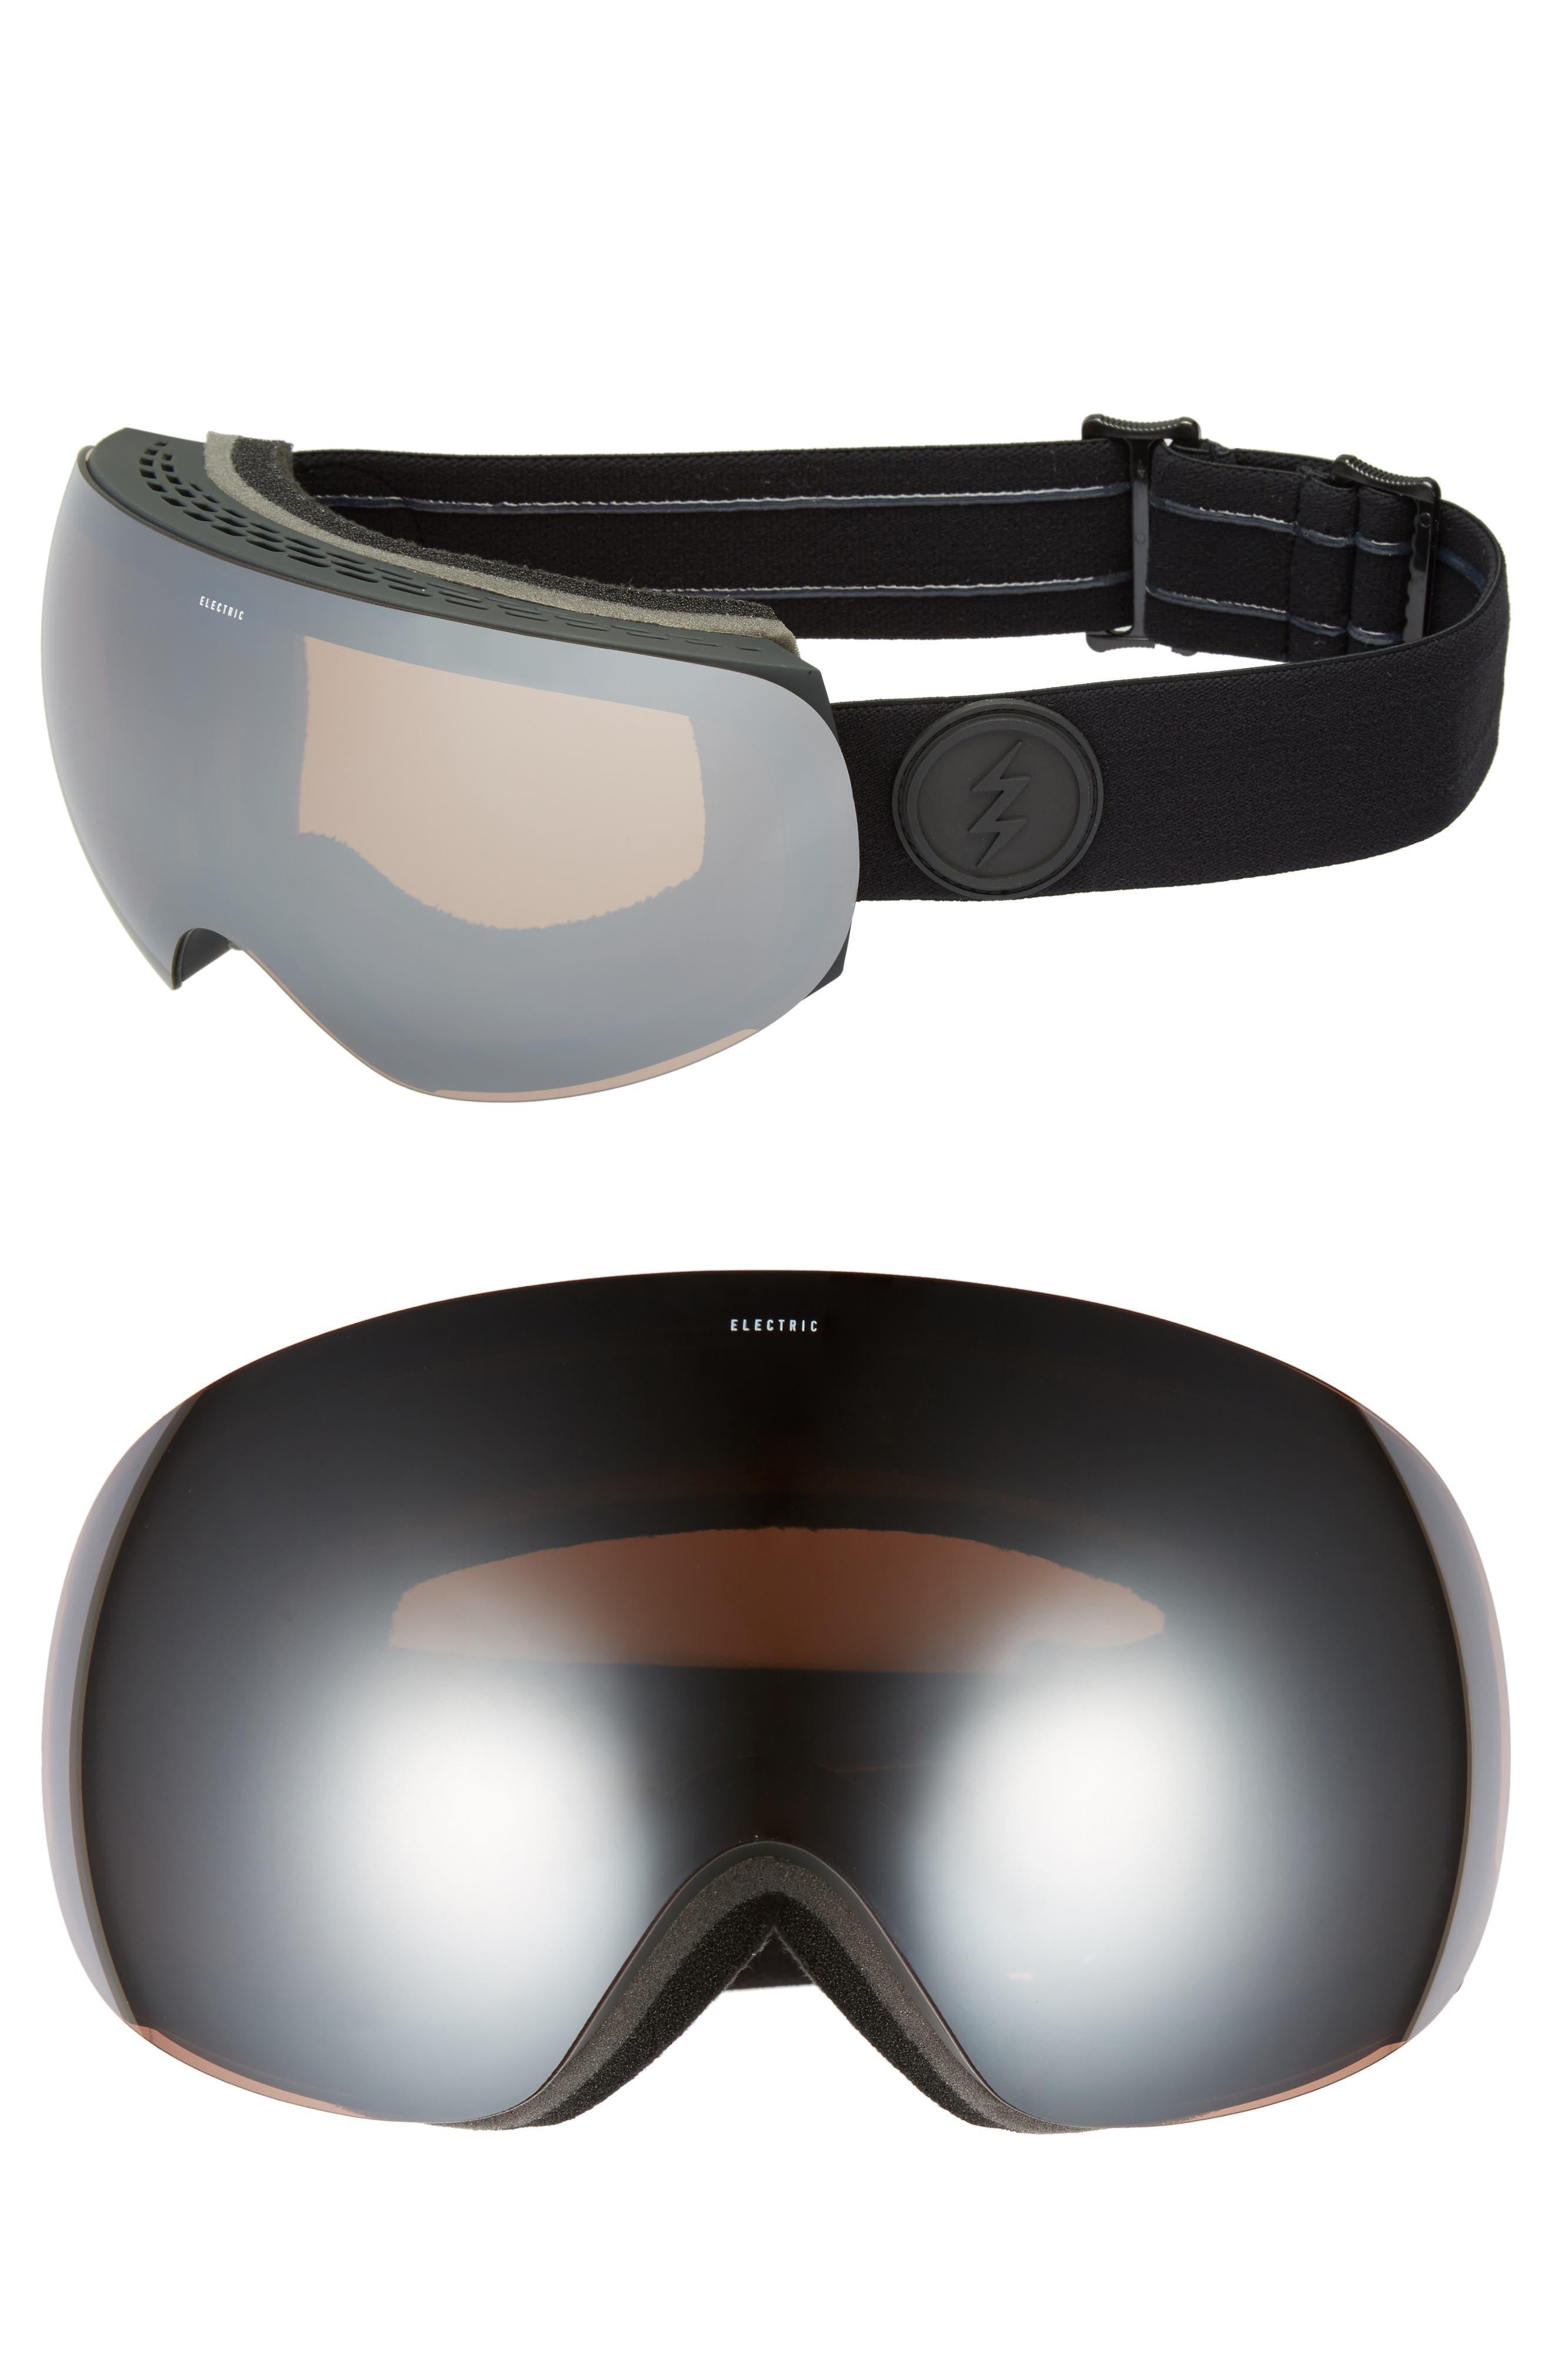 EG3 Snow Goggles,                         Main,                         color, Matte Black/ Silver Chrome